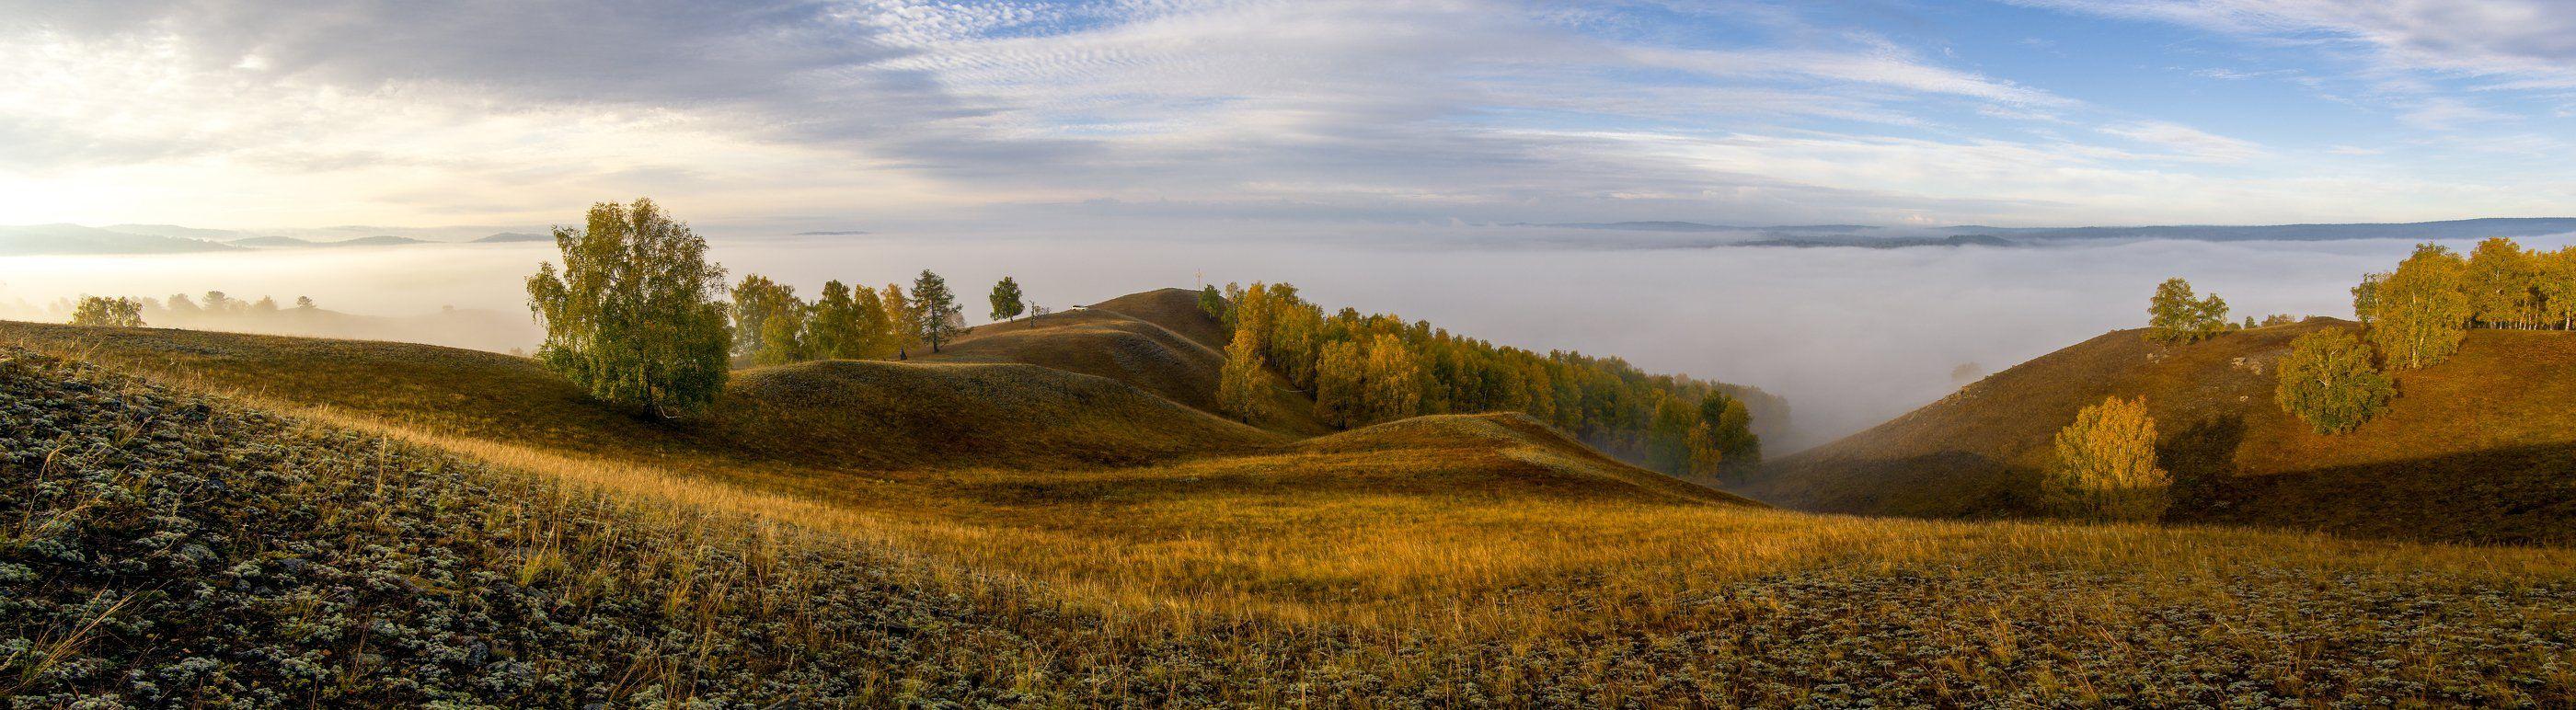 панорама, рассвет, восход, заря, туман, горы, урал, Леонид Максименко